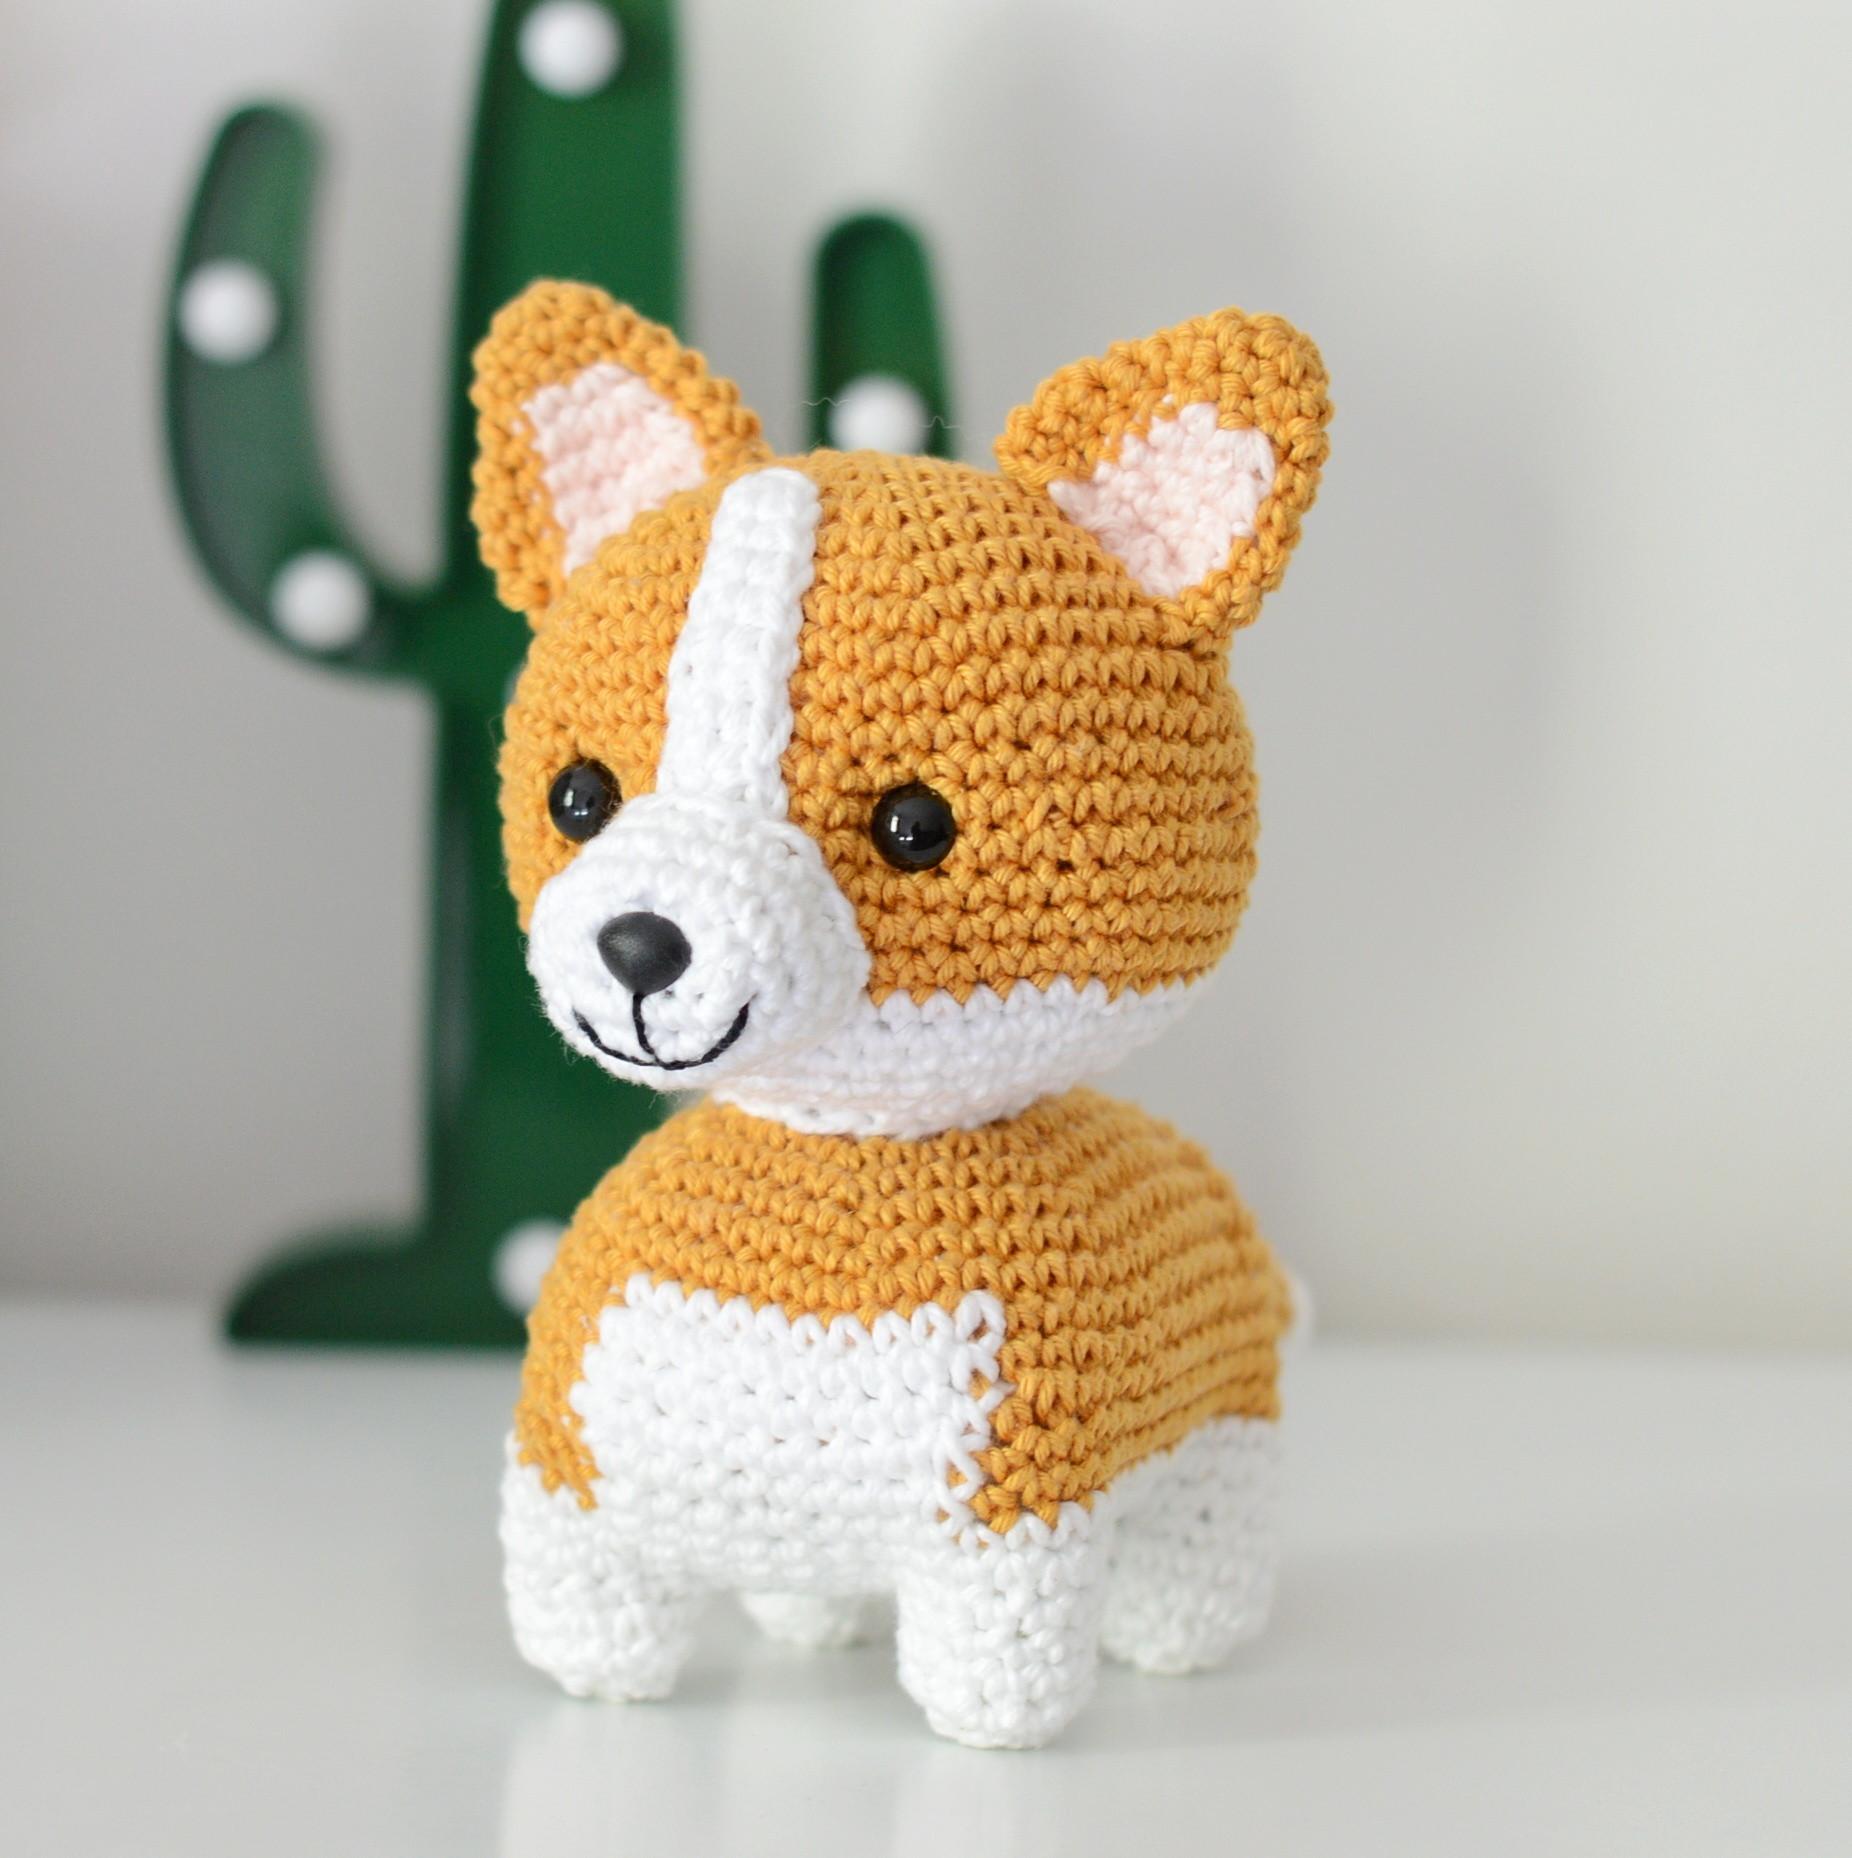 Corgi Big Booty Handmade Crochet Doll, Design & Craft, Handmade ... | 1858x1852